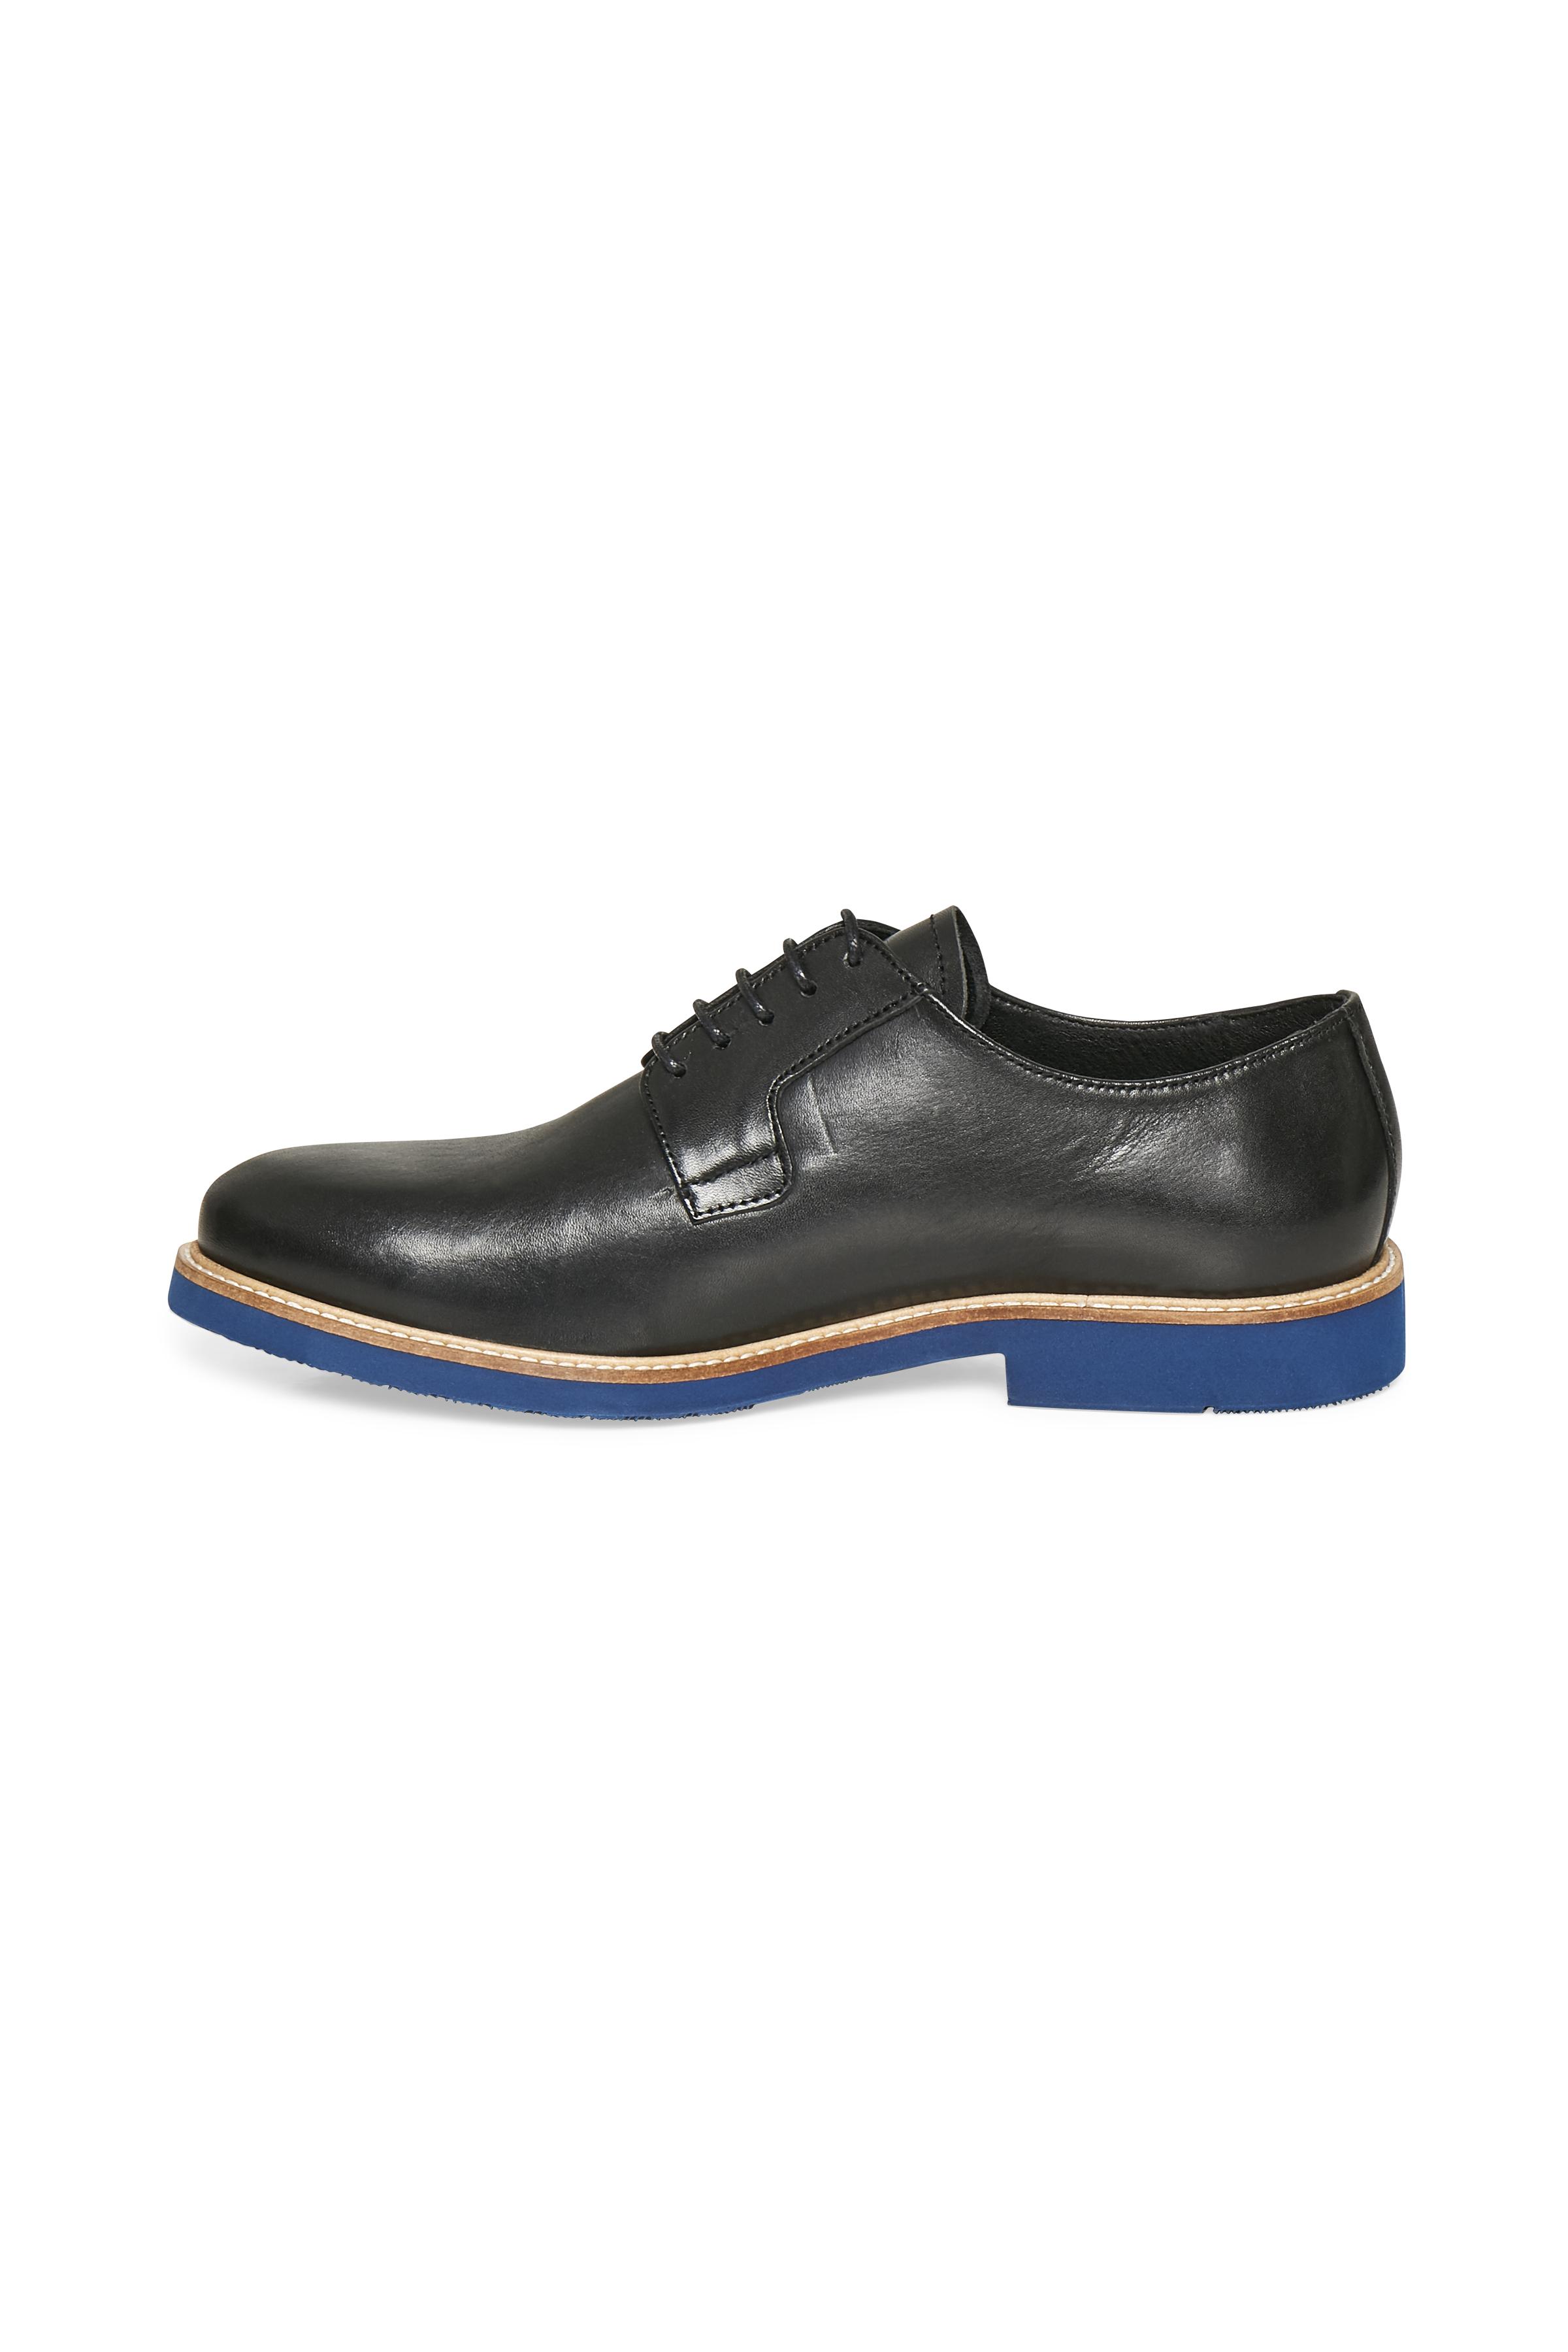 Black Micro Shoe – Køb Black Micro Shoe fra str. 41-45 her